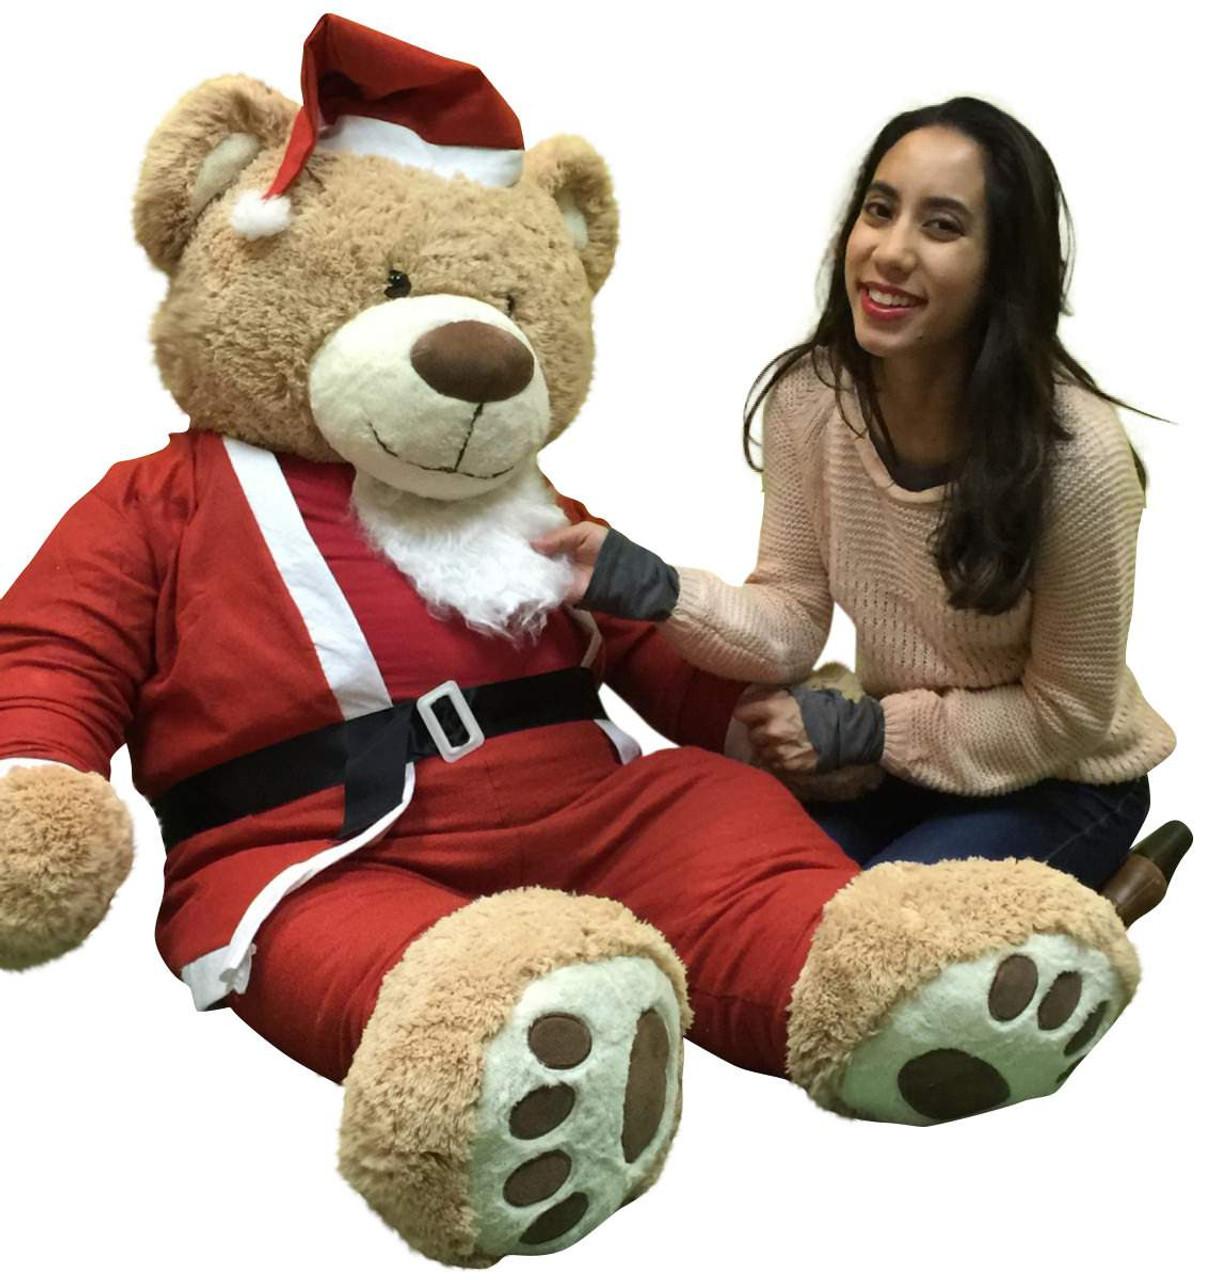 Giant Christmas Teddy Bear 60 Inch Soft Wears Santa Claus Suit 5